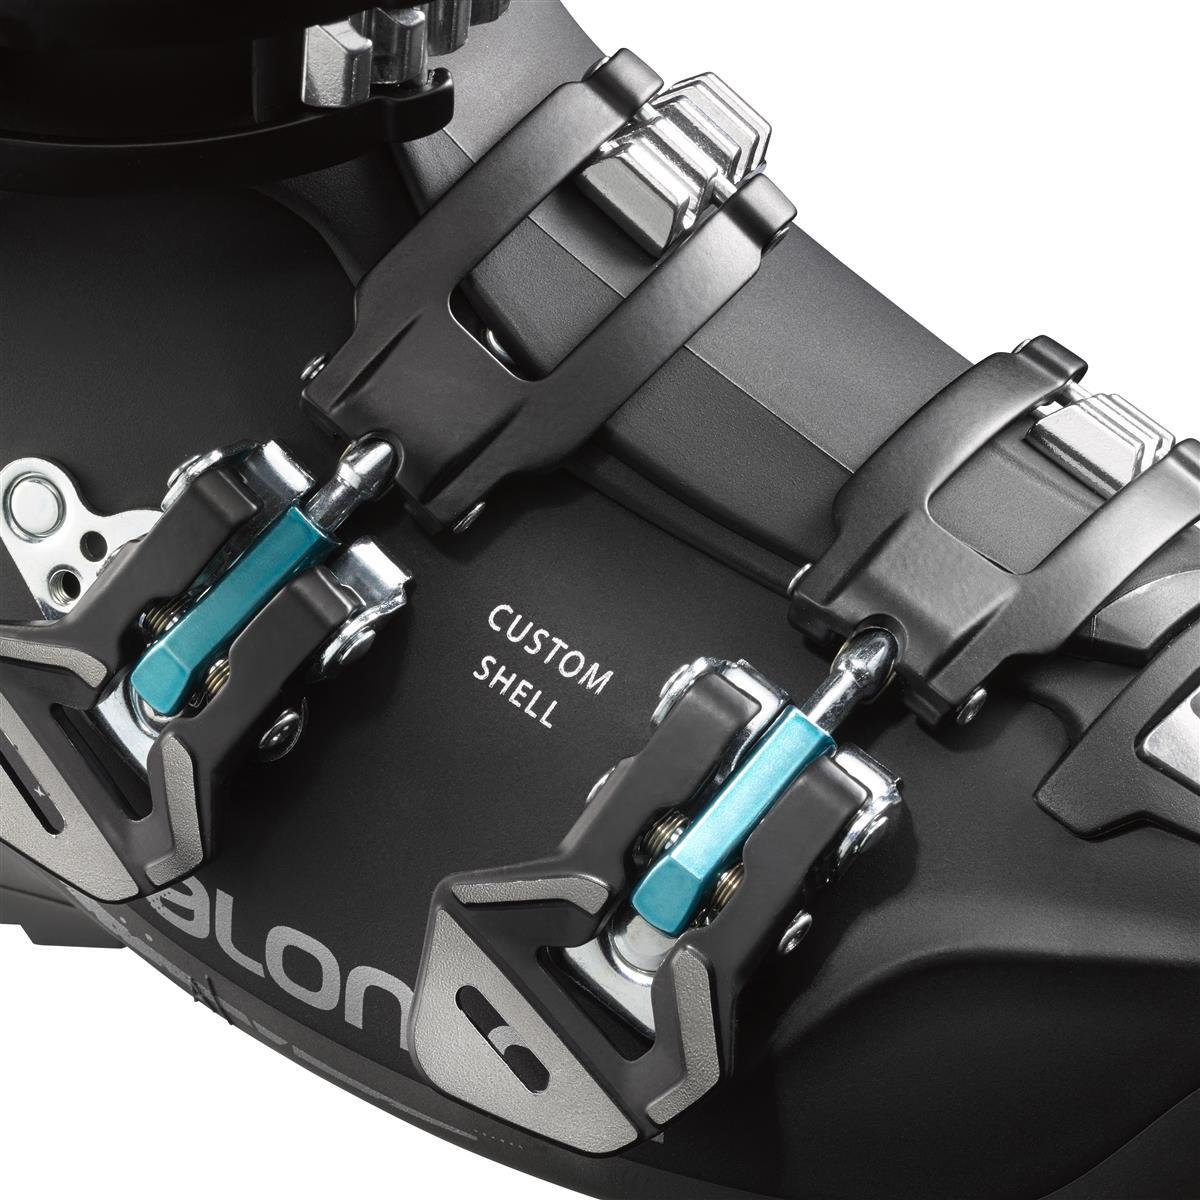 Salomon X Pro 90 W Black Anthracite White 391529 17 18 - Skladem 8081428f87